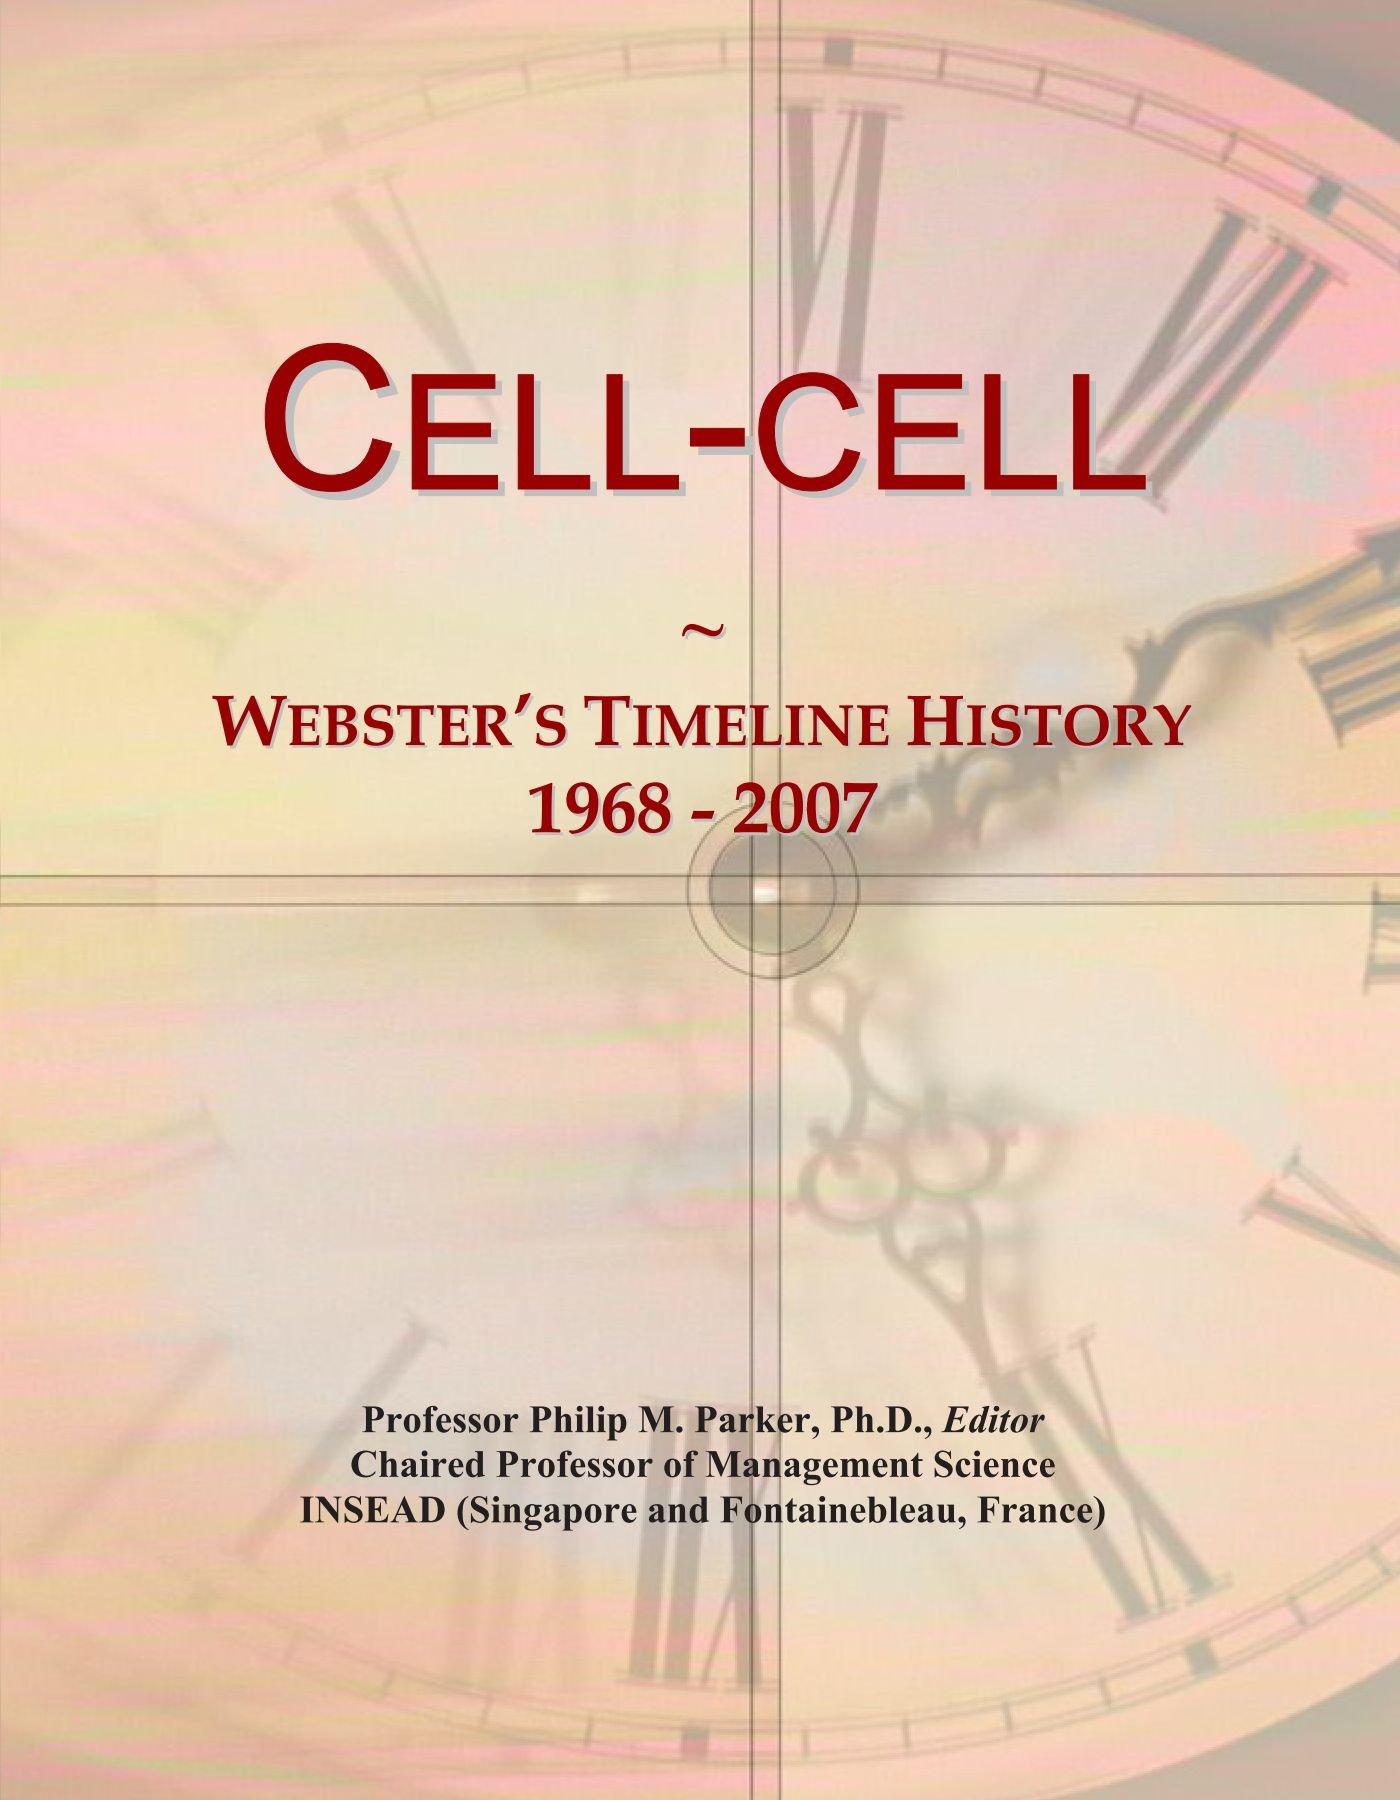 Download Cell-cell: Webster's Timeline History, 1968 - 2007 pdf